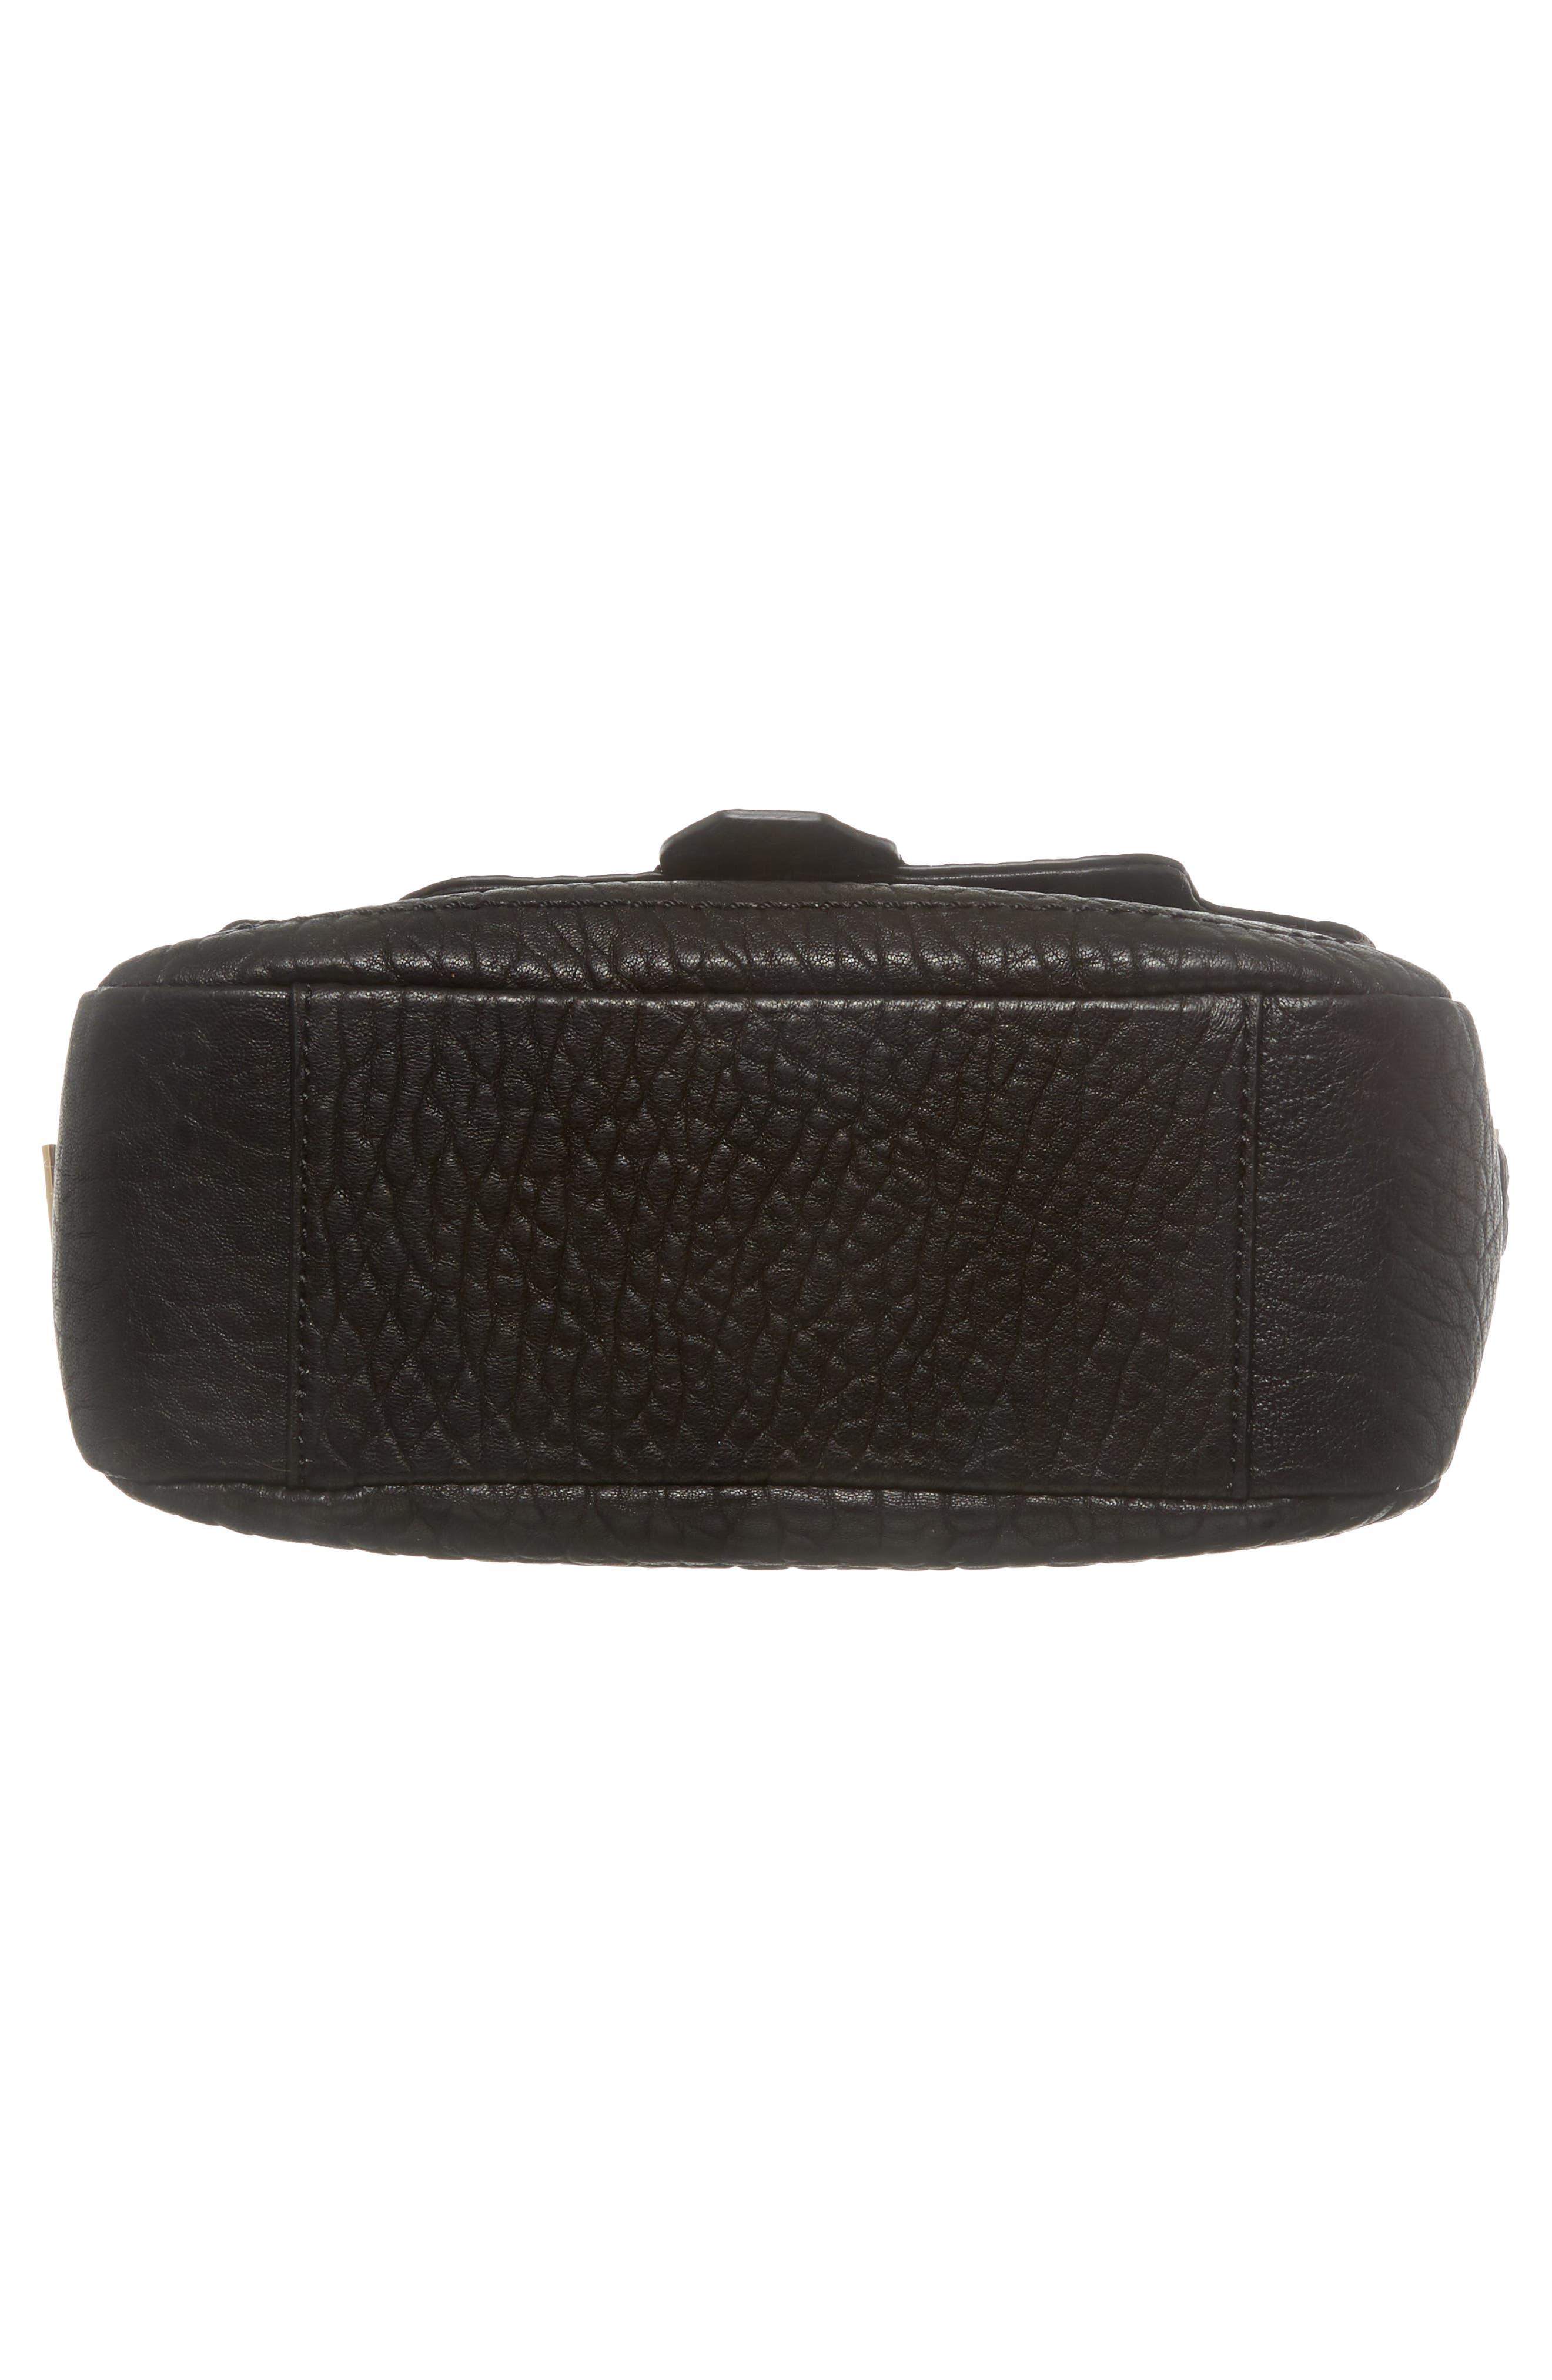 Fava Leather Crossbody Bag,                             Alternate thumbnail 11, color,